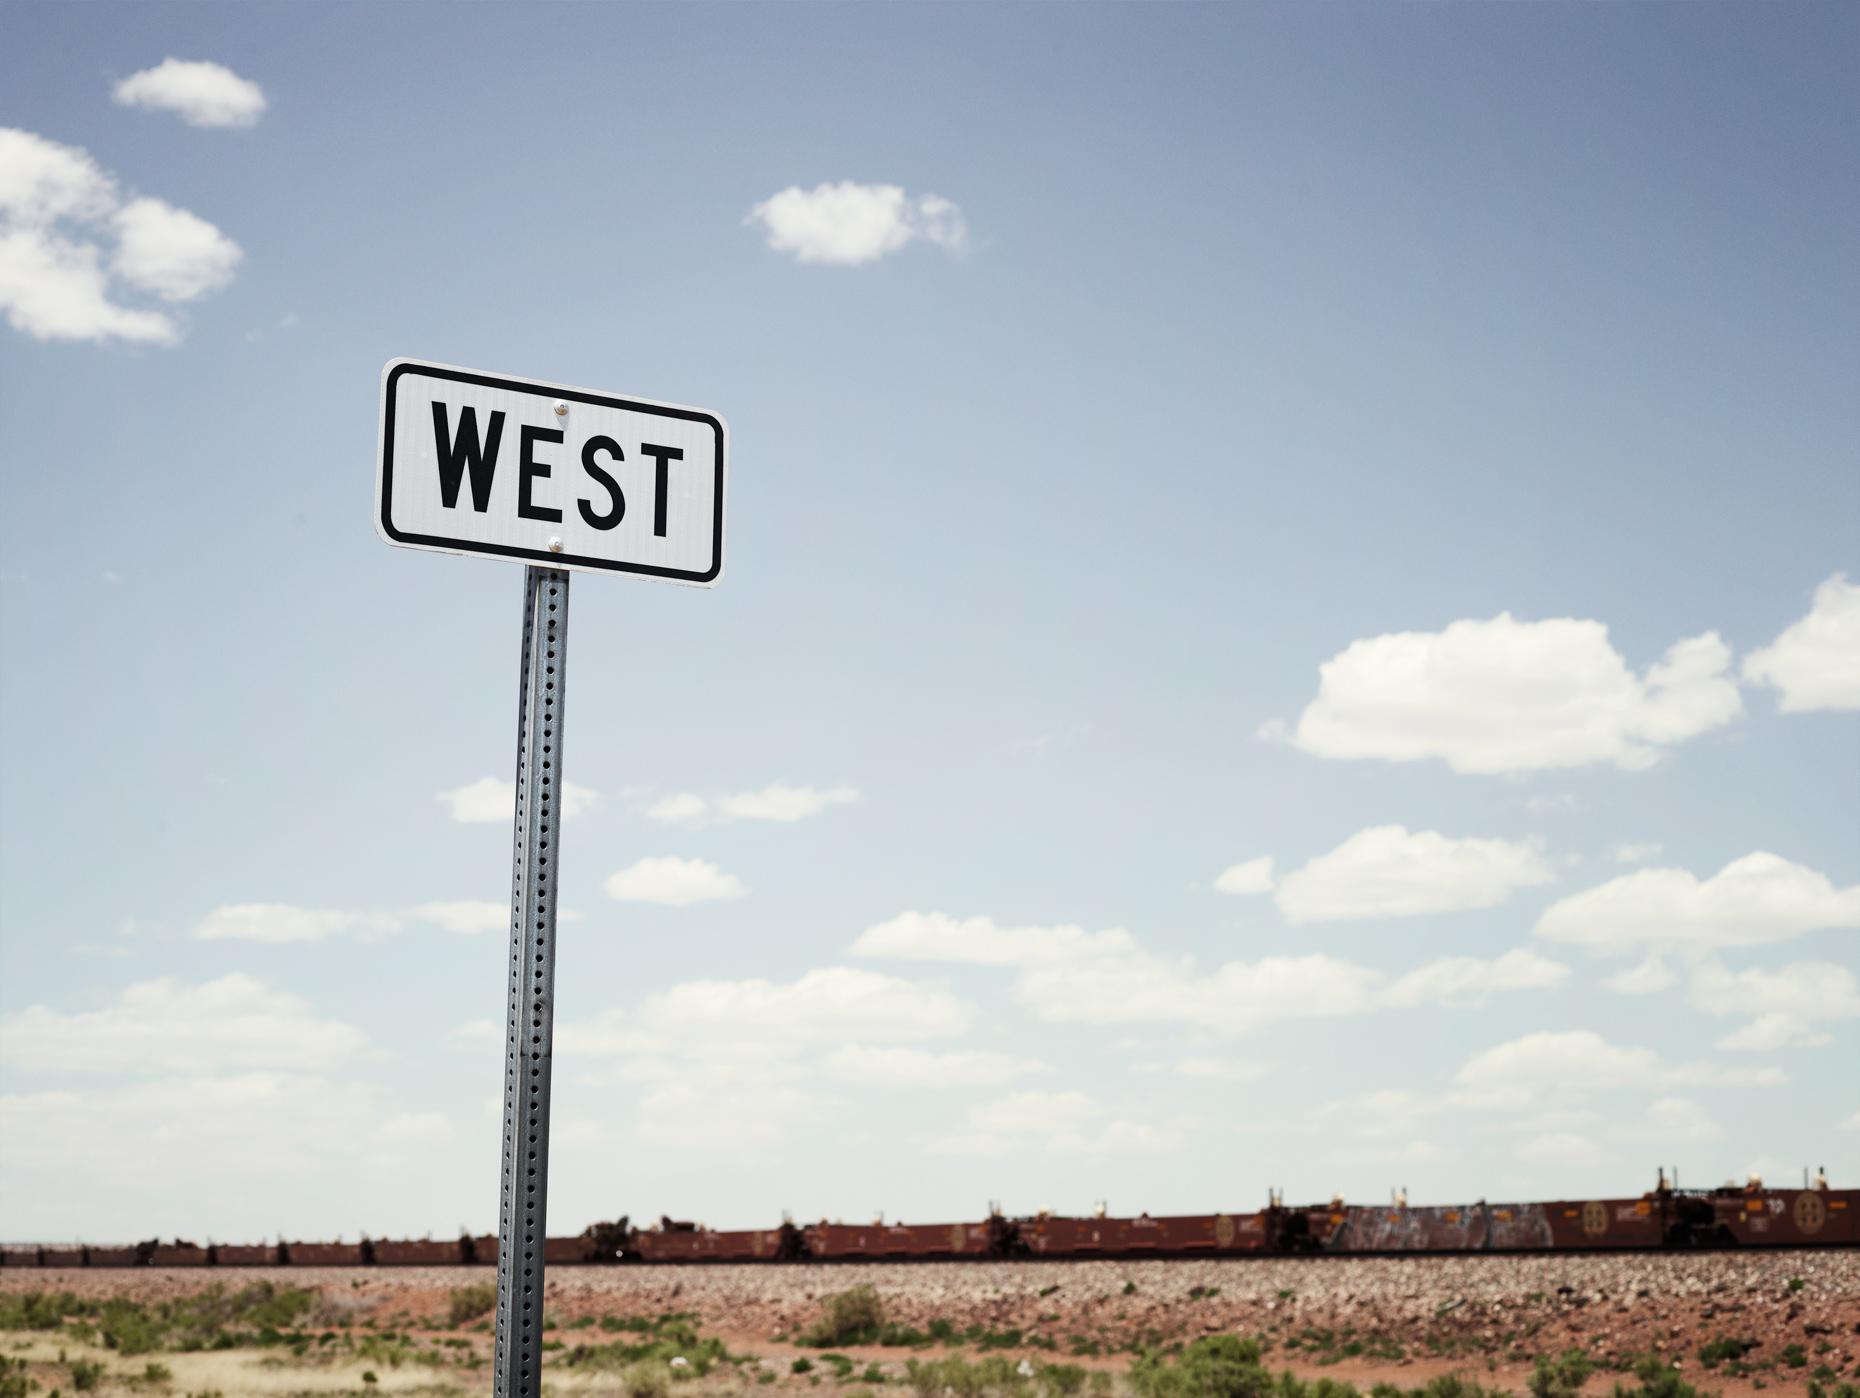 Projects_Travel_Photography_Derek_Israelsen_047_Roadtrip_Home_West.jpg